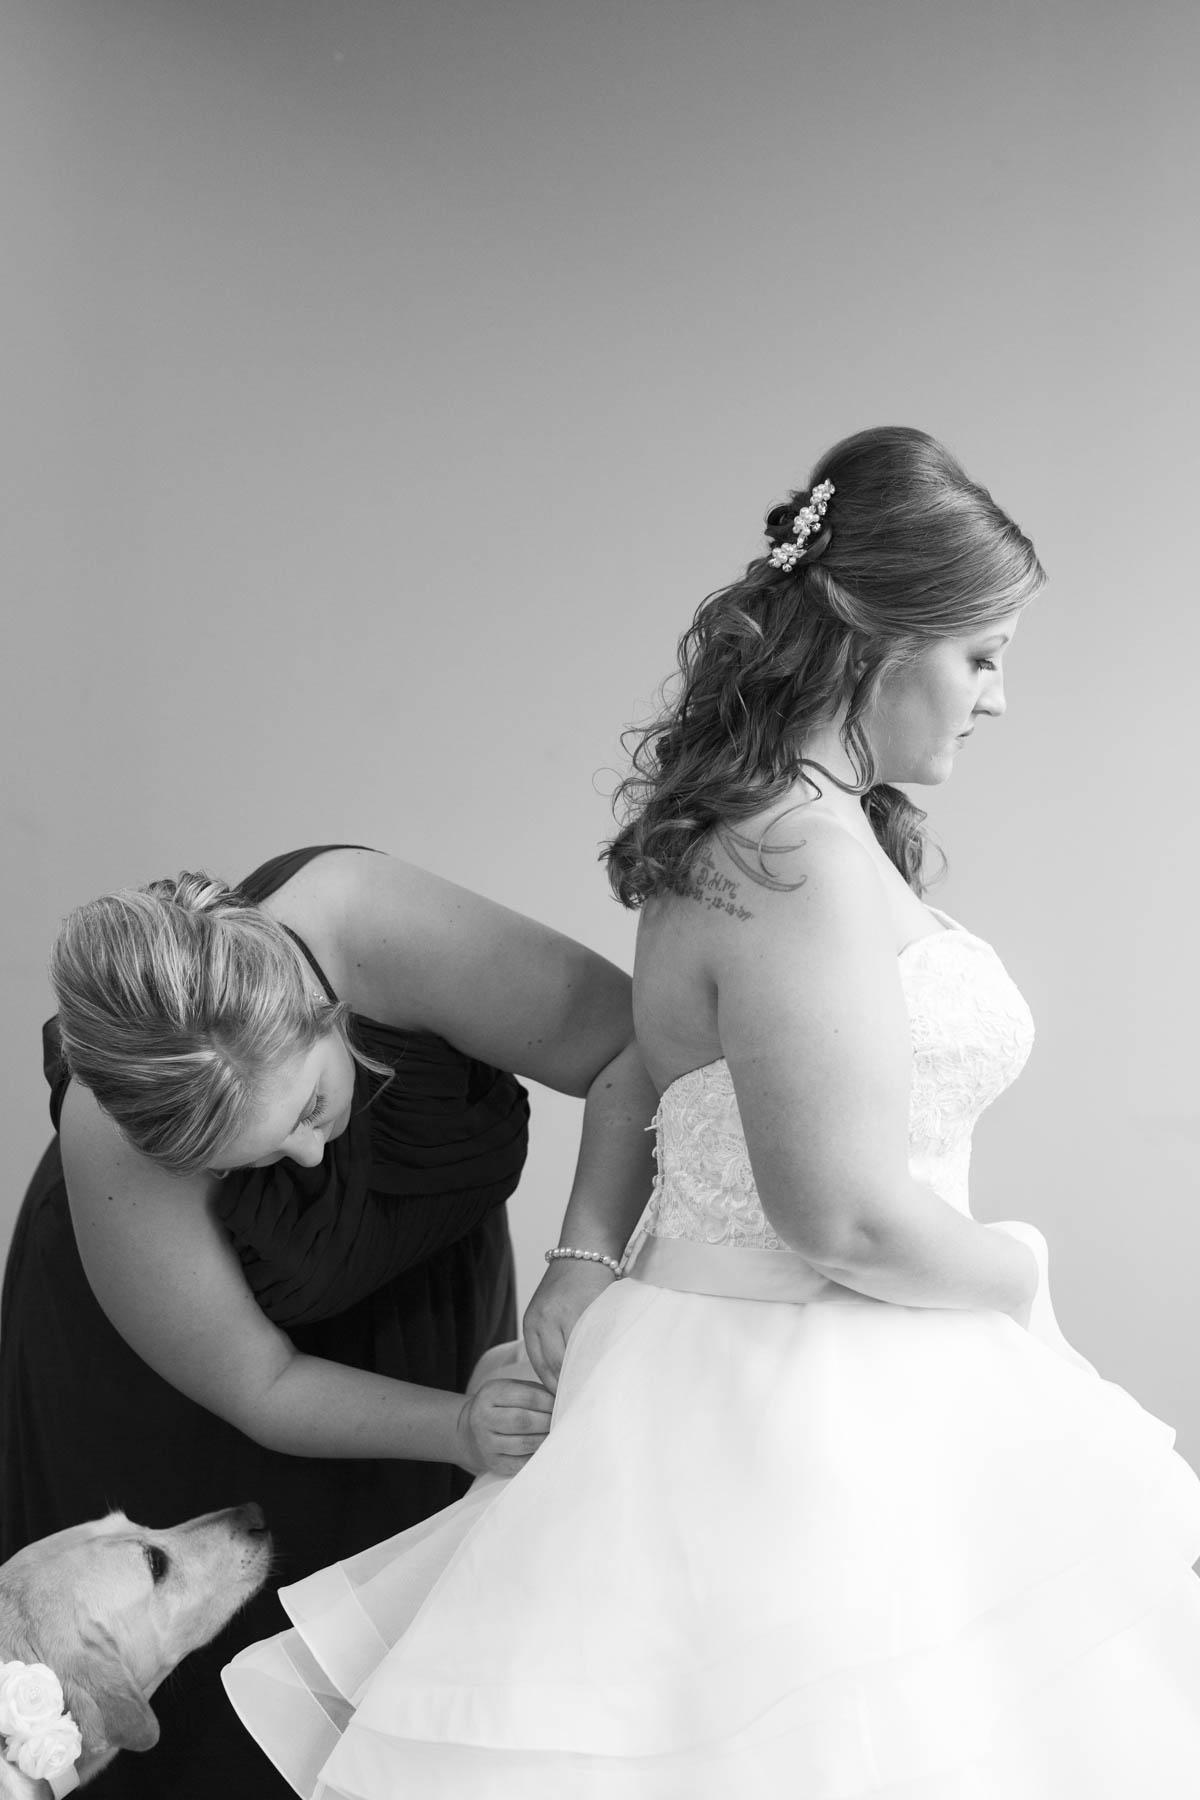 shotbychelsea_blog_wedding-7.jpg